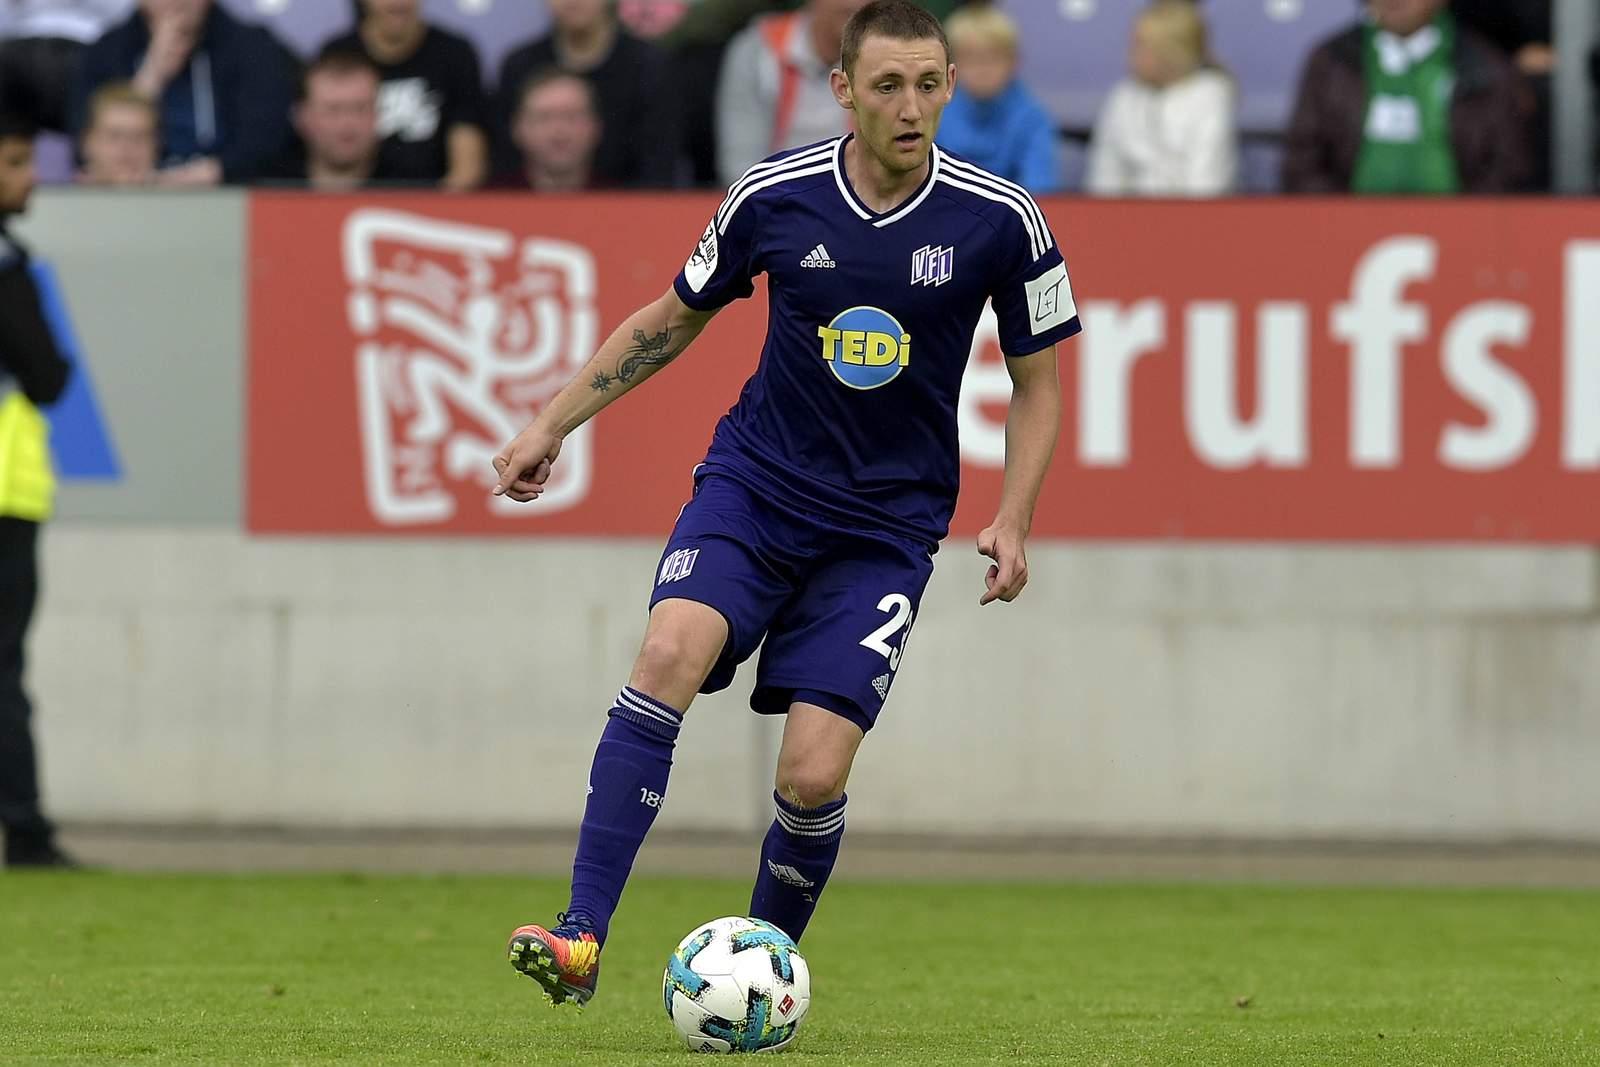 Christian Bickel vom VfL Osnabrück